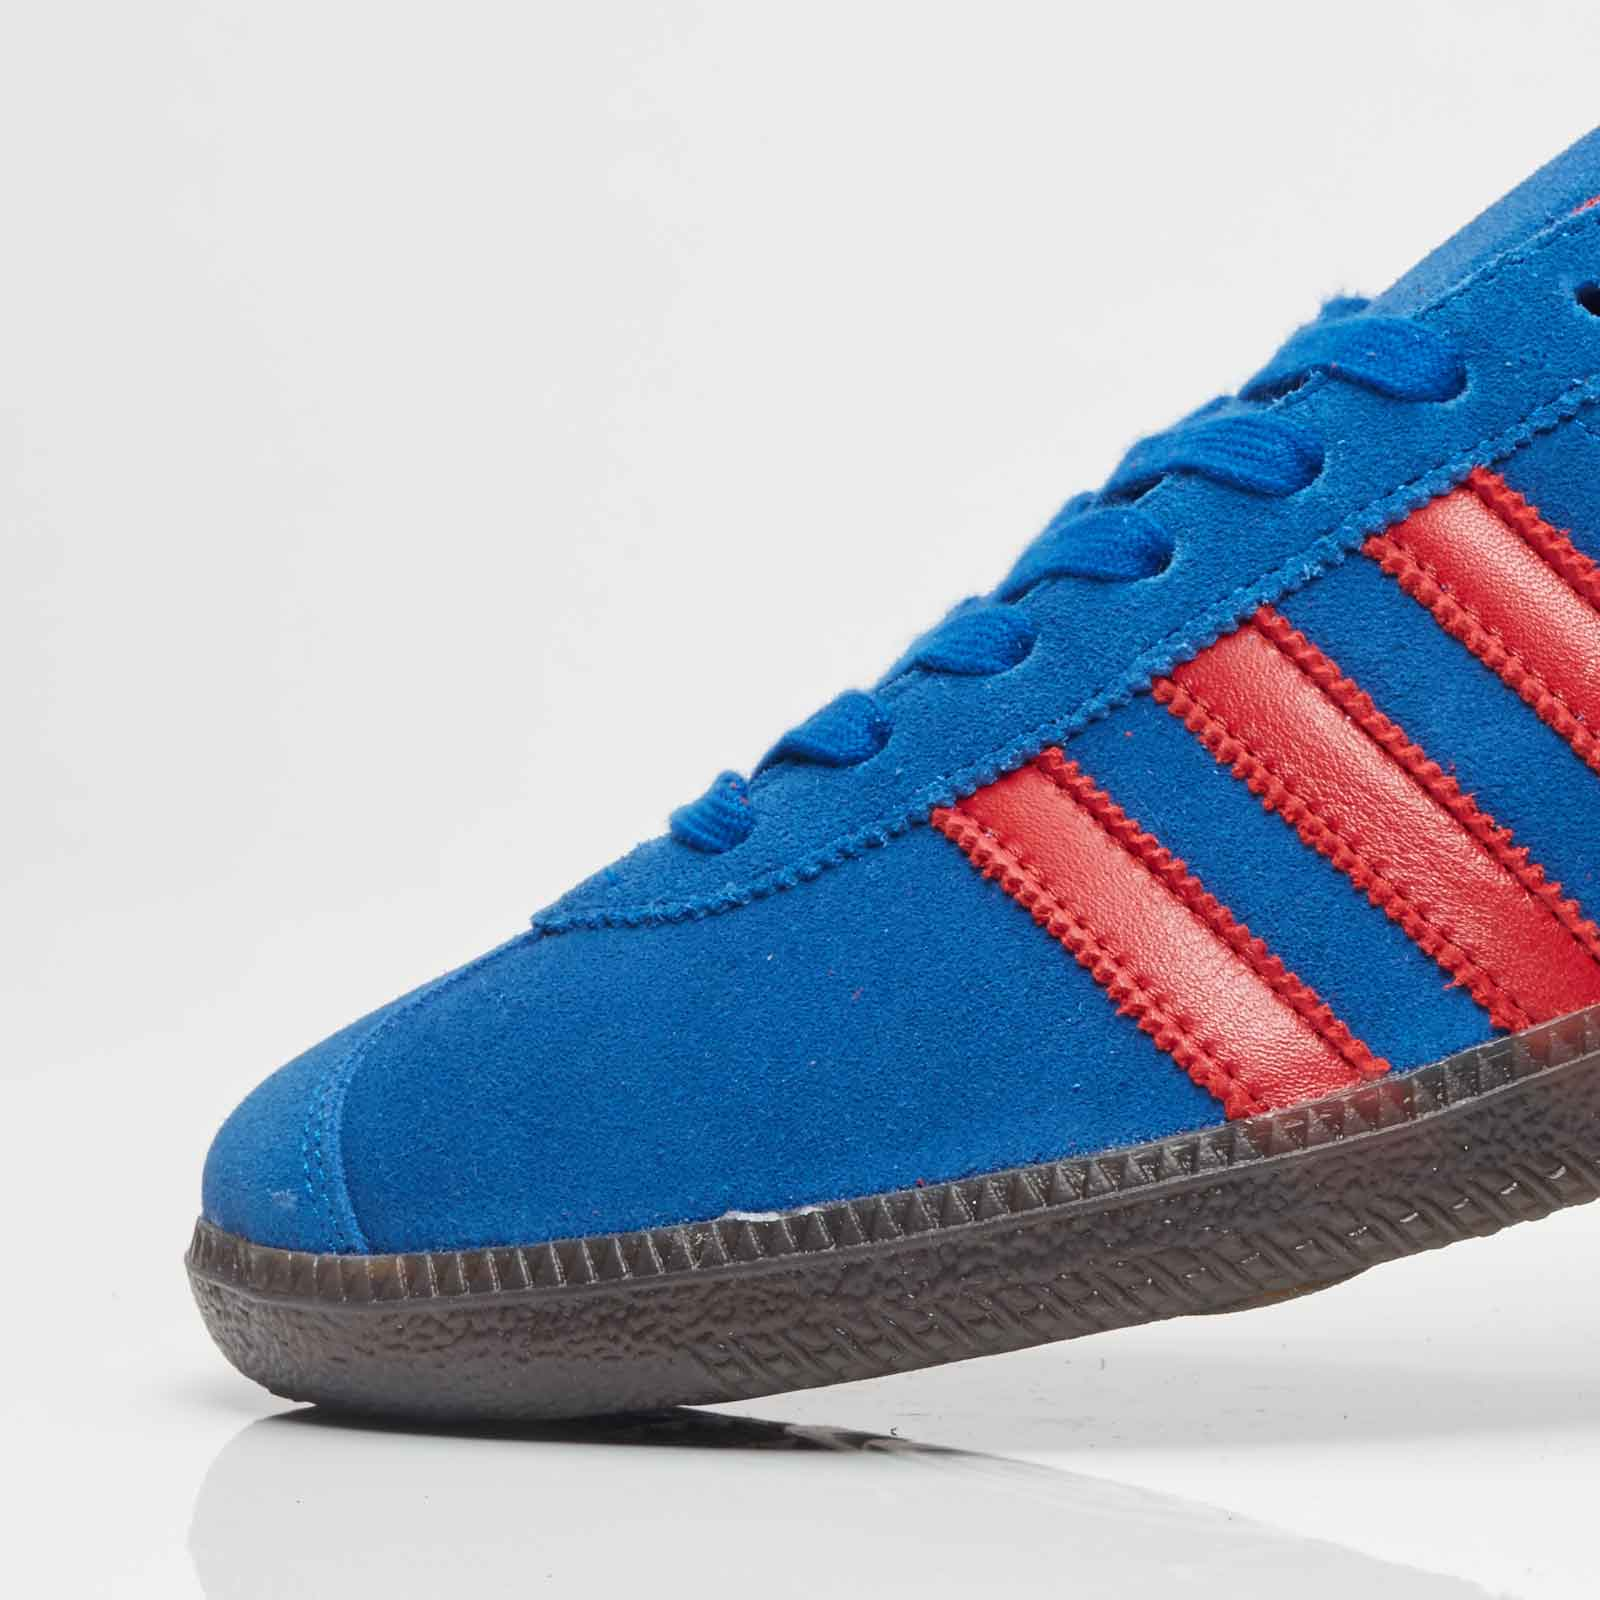 adidas Originals Spiritus SPZL | Adidas sneakers, Adidas